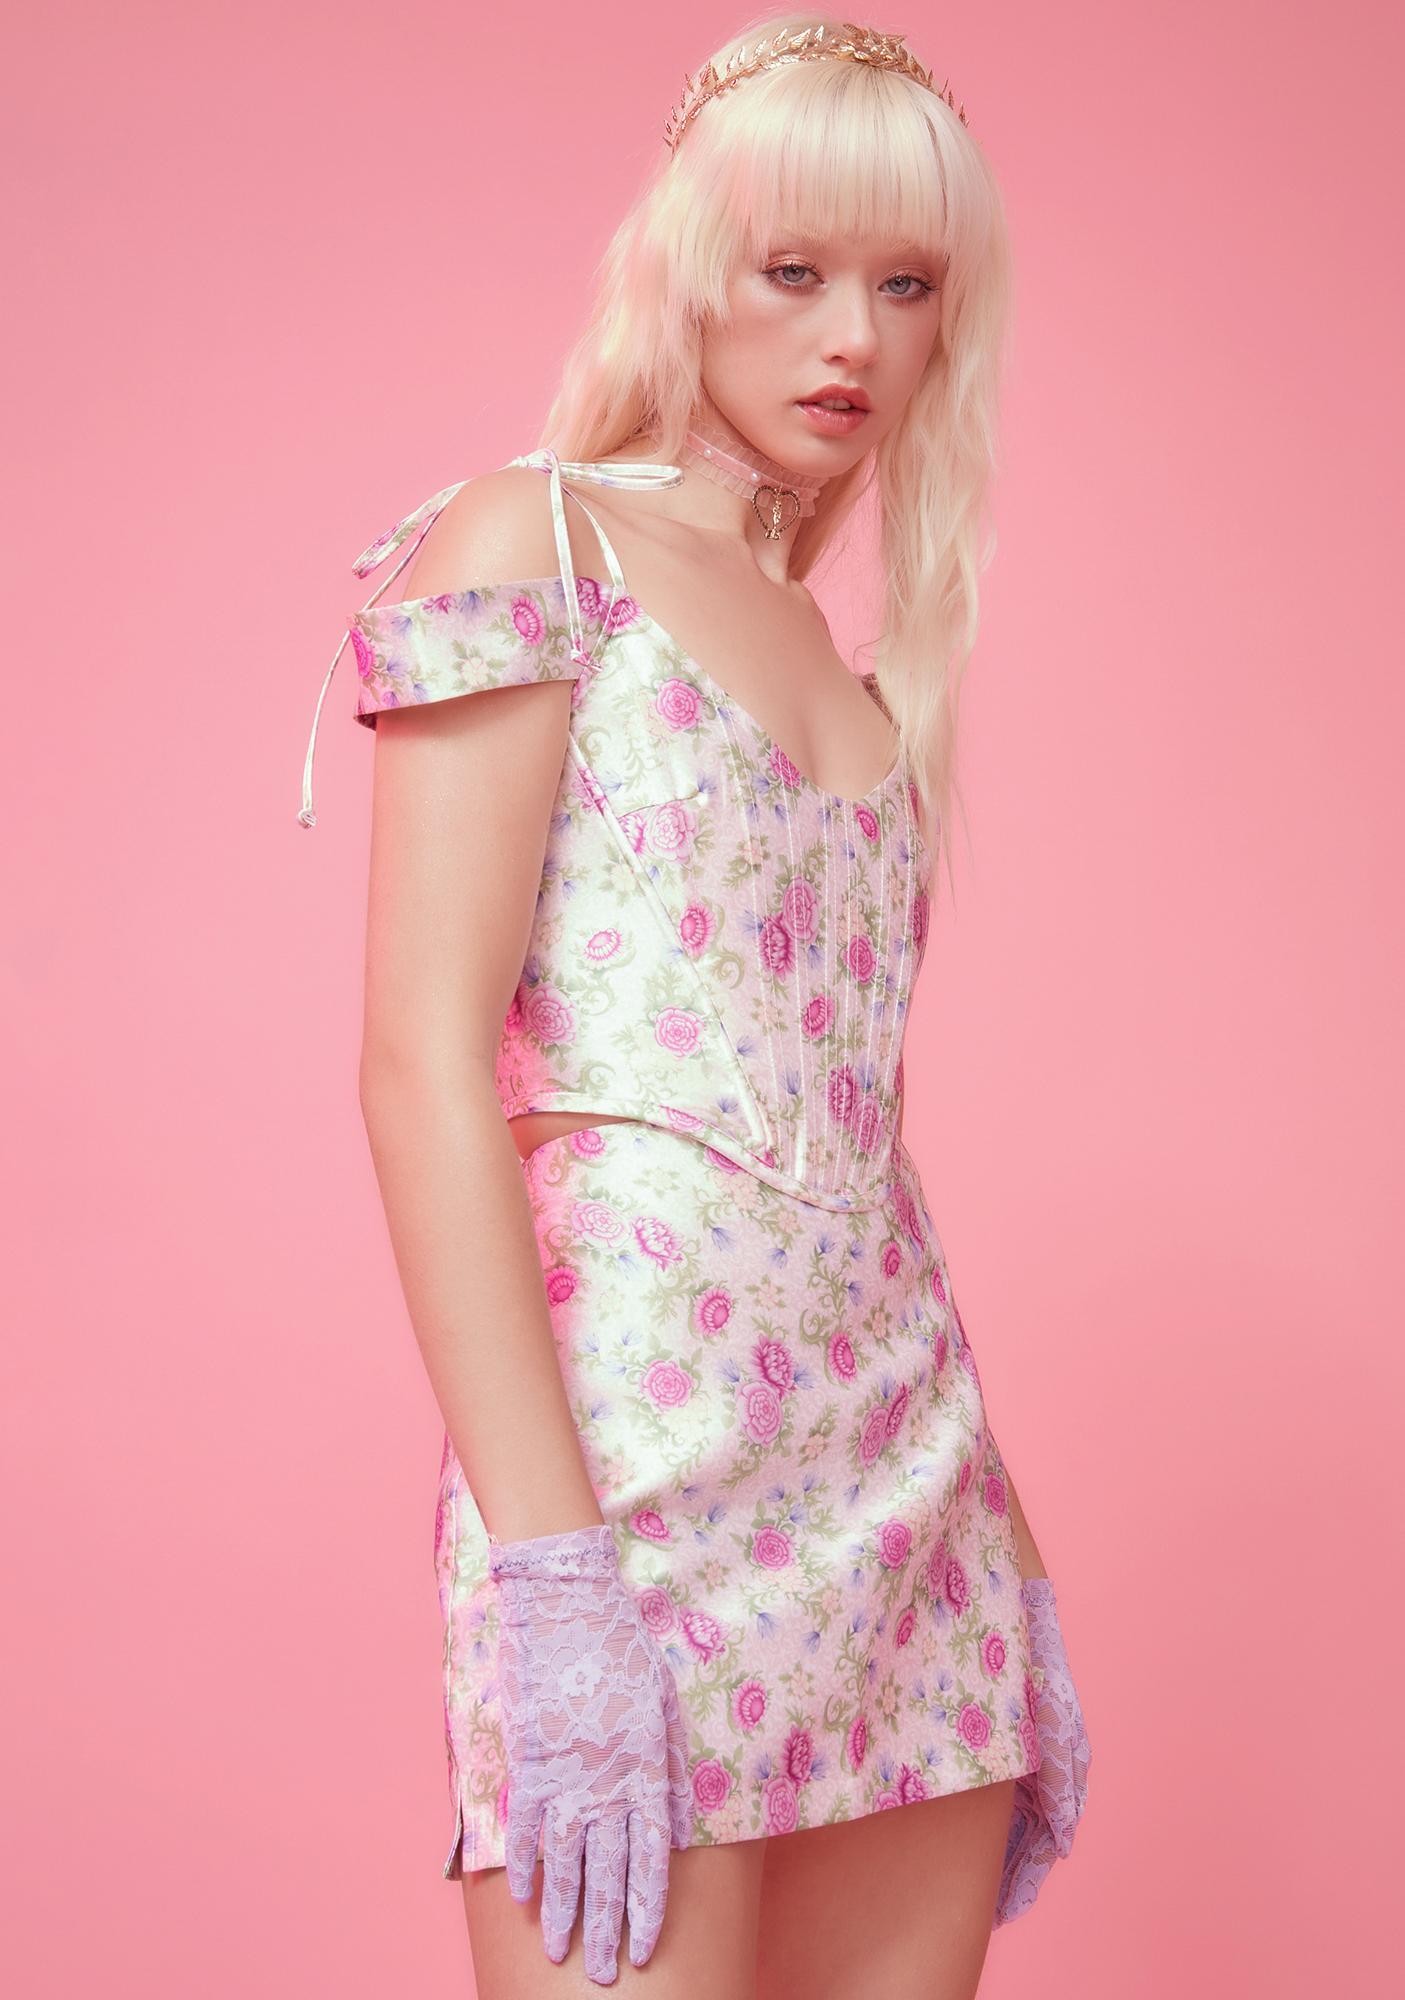 Sugar Thrillz Blooming Polaroid Fever Mini Skirt